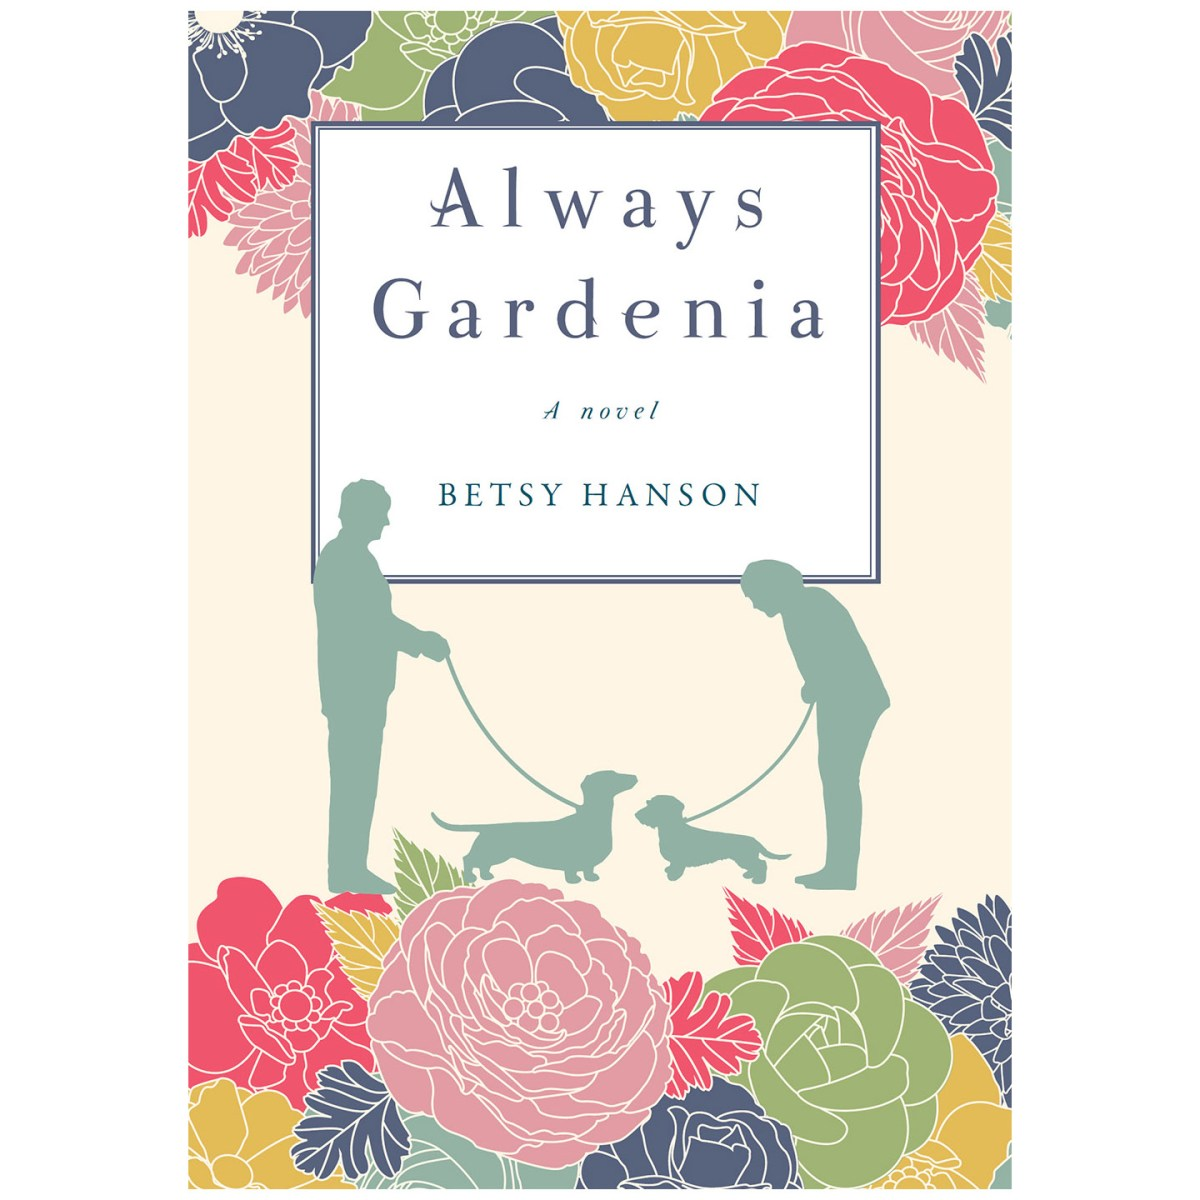 Always Gardenia by Betsy Hanson